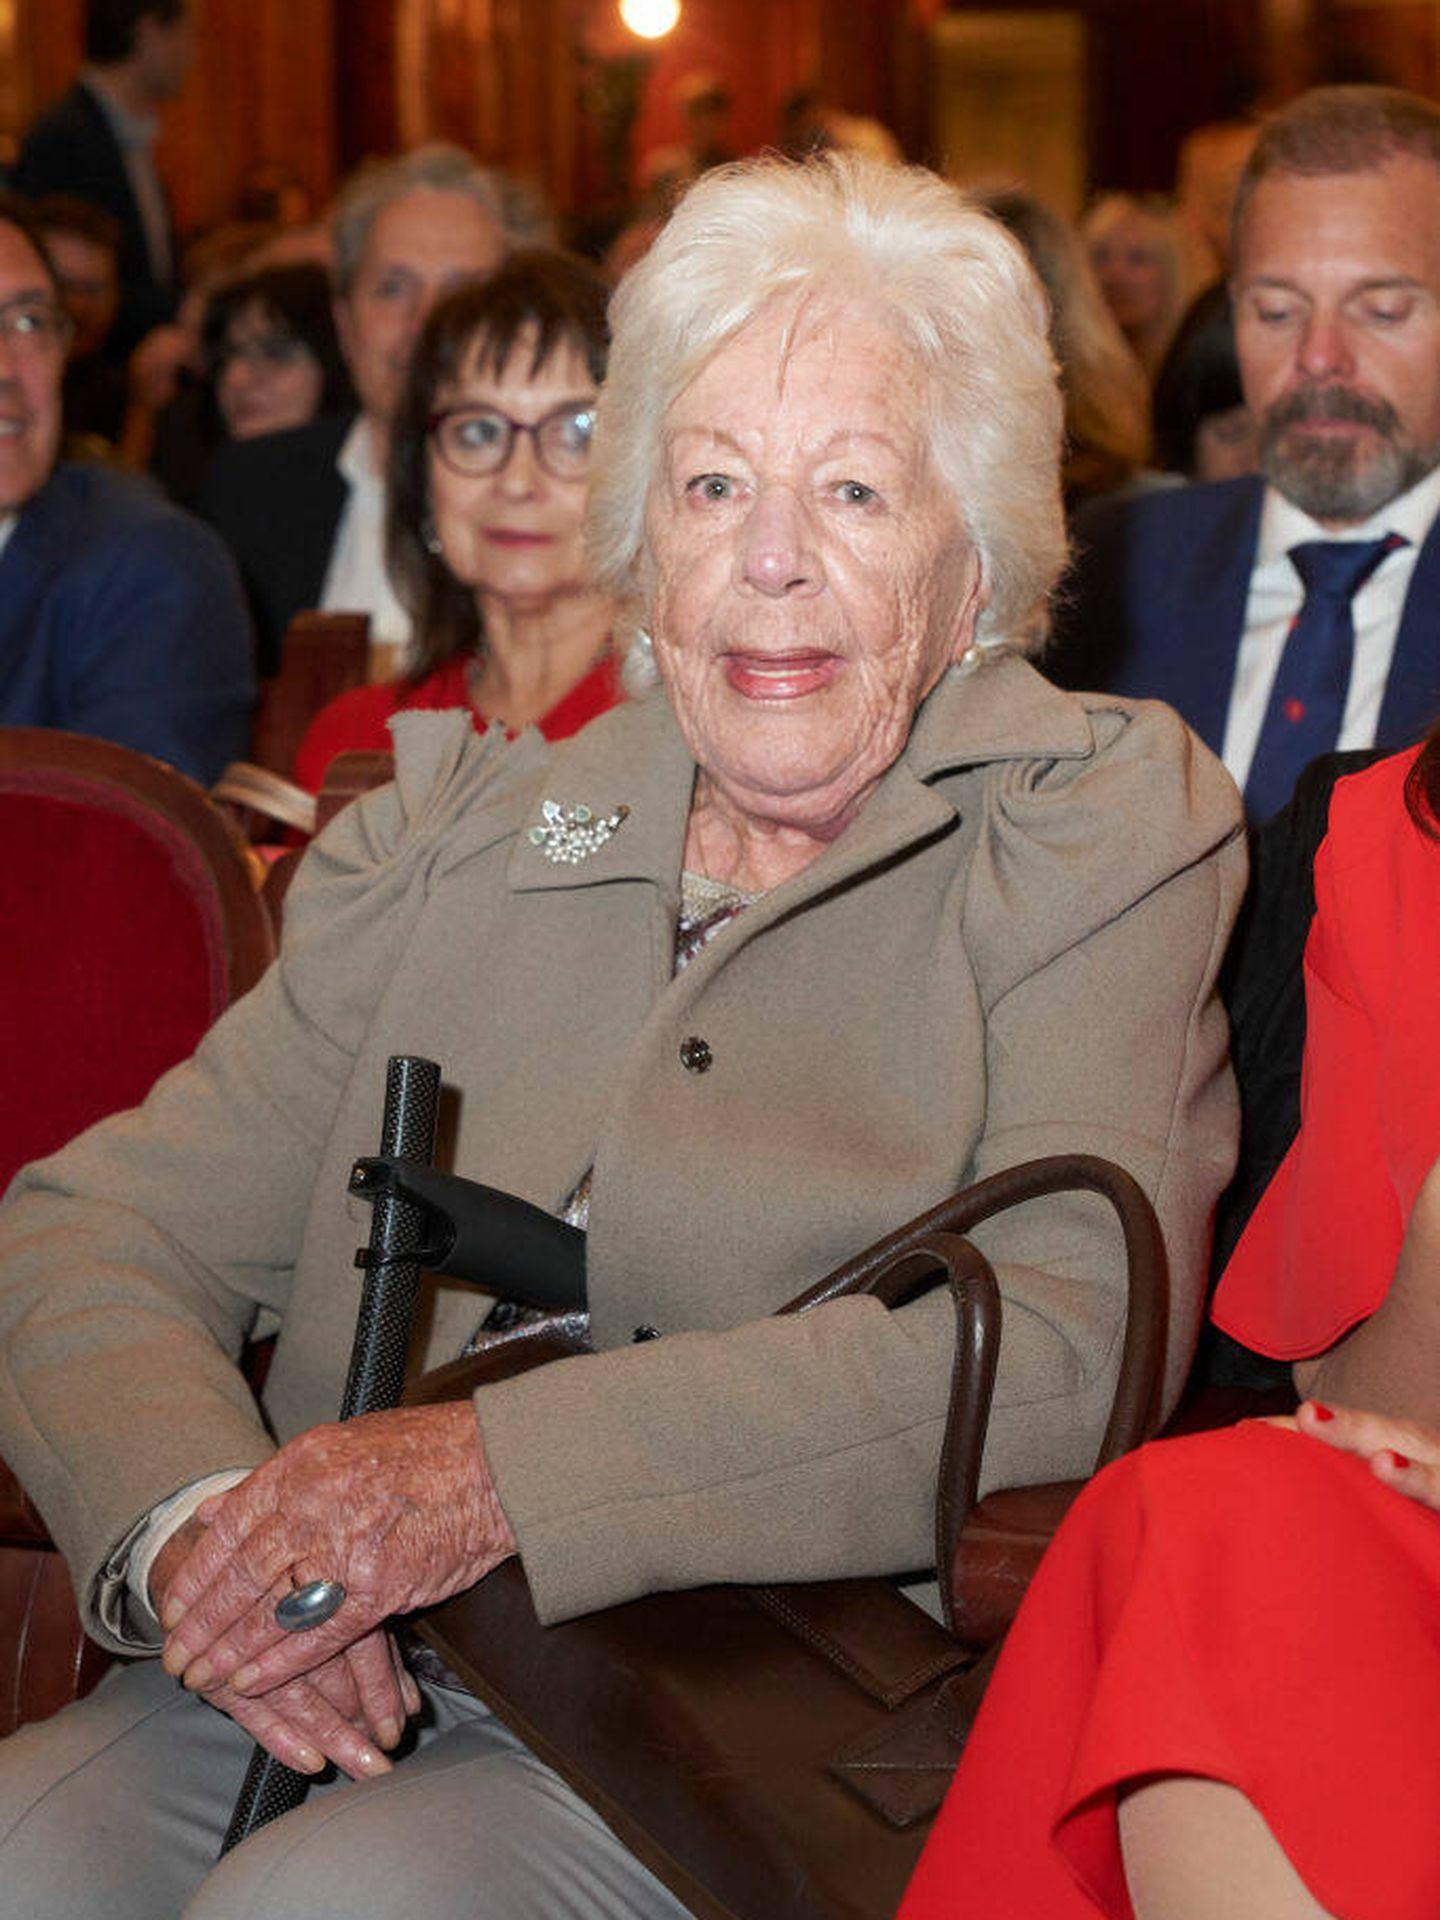 La abuela de la reina Letizia, durante la entrega de premios. (Getty)